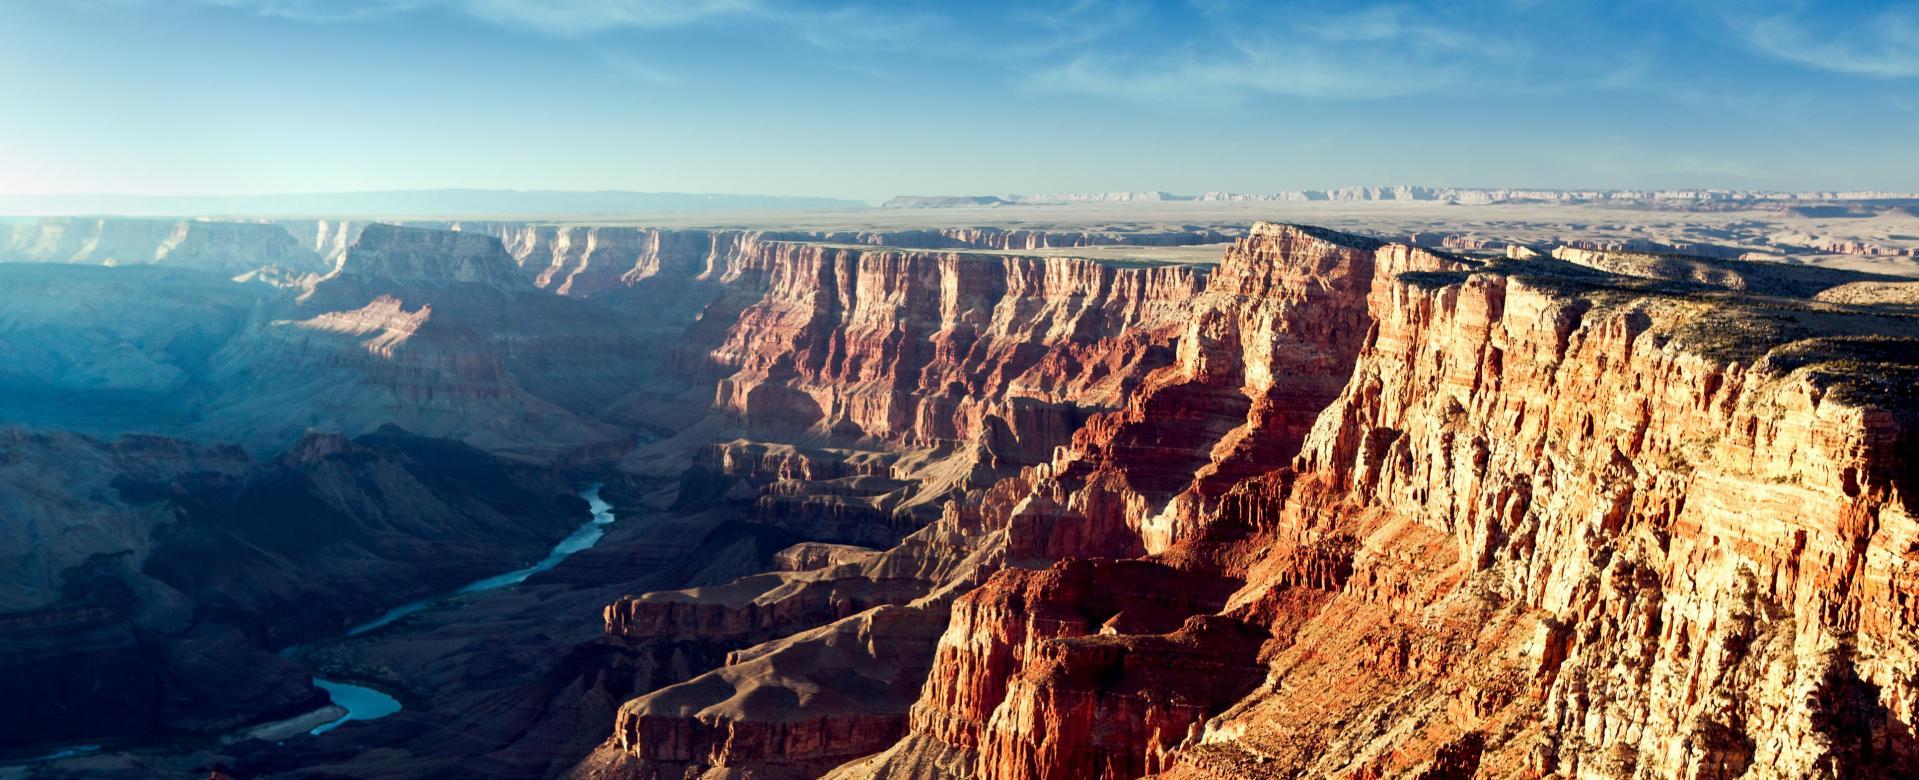 Voyage à pied : Du grand canyon à yellowstone